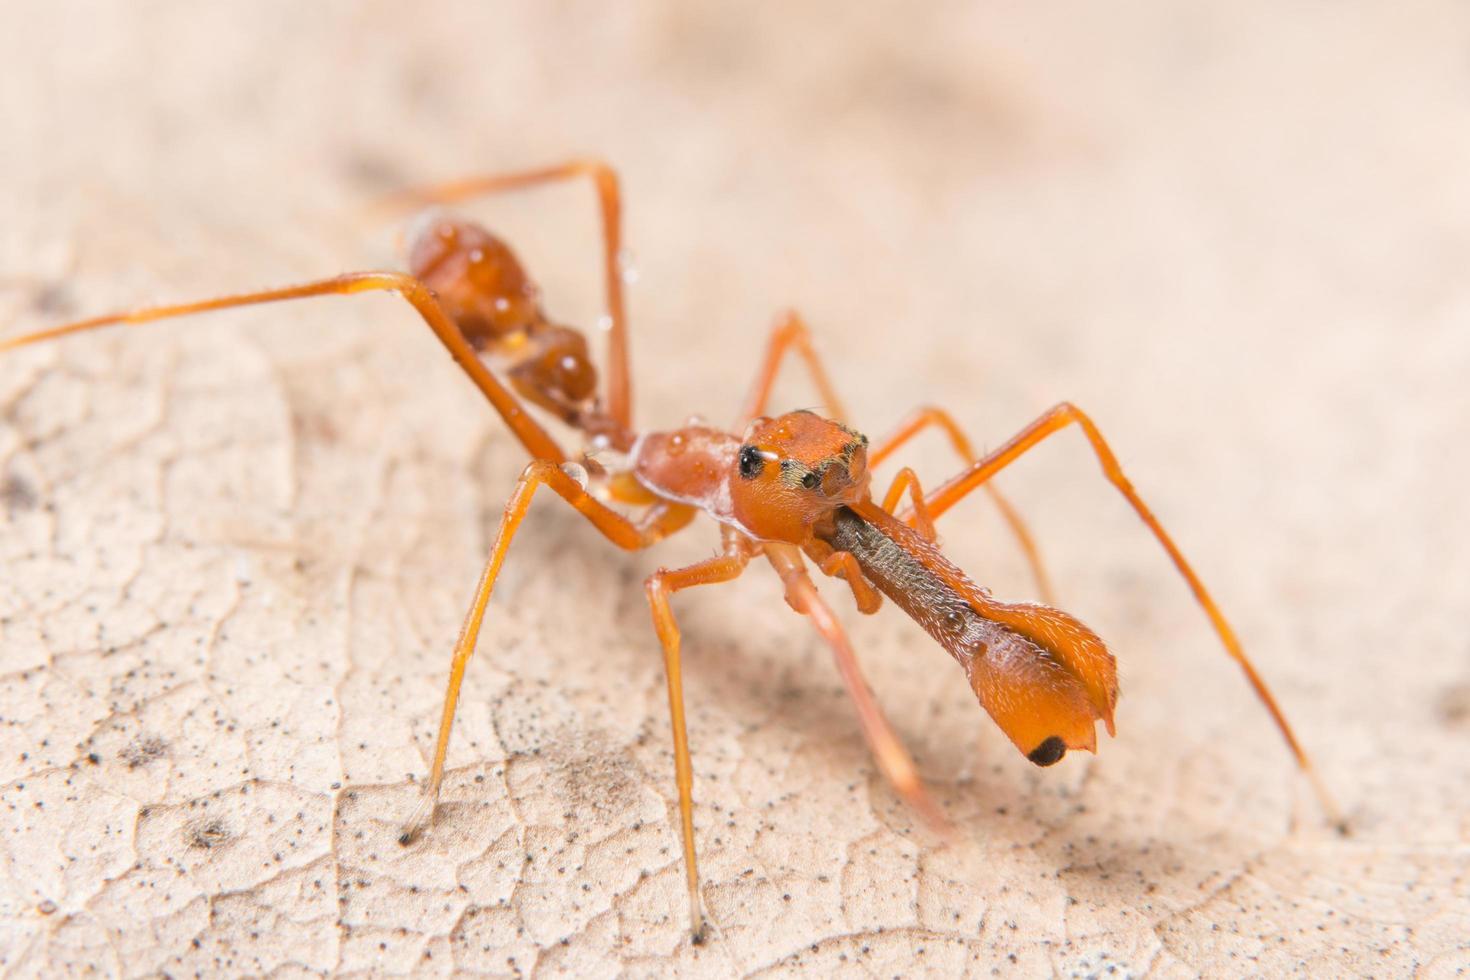 primer plano de araña parecida a una hormiga foto